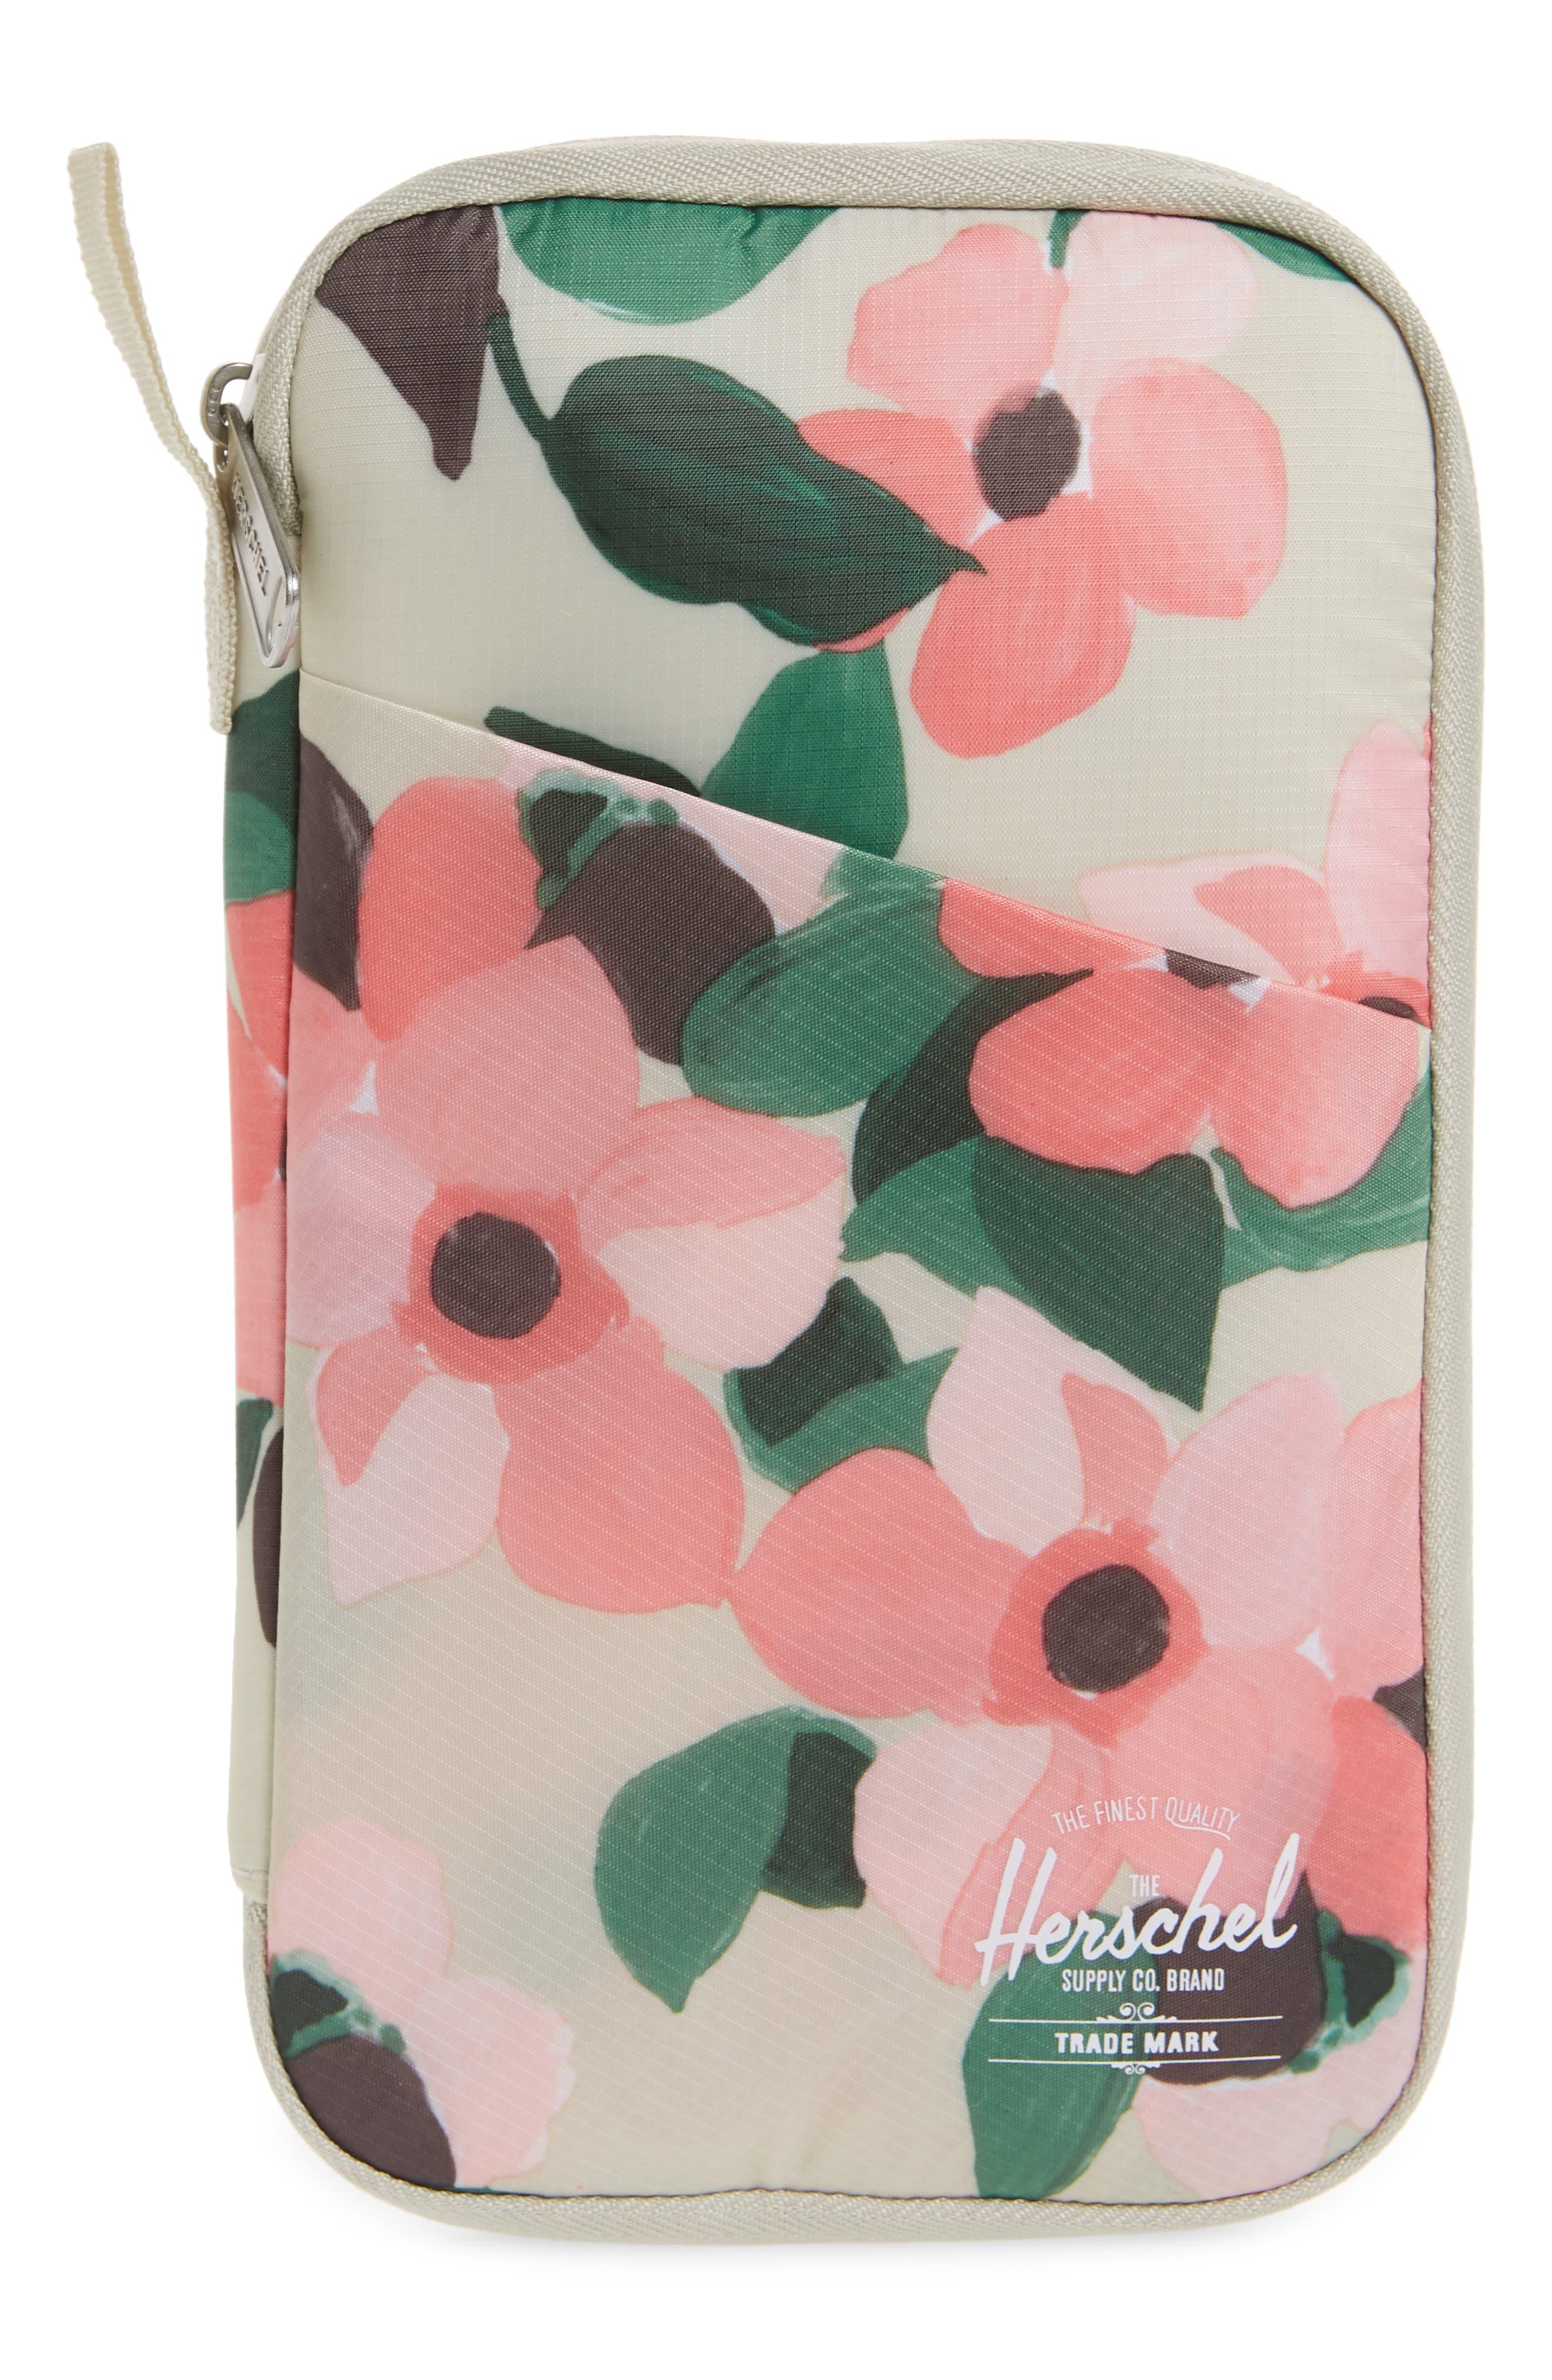 Herschel Supply Co. Women's Herschel Supply Co. Floral Print Travel Wallet - Pink